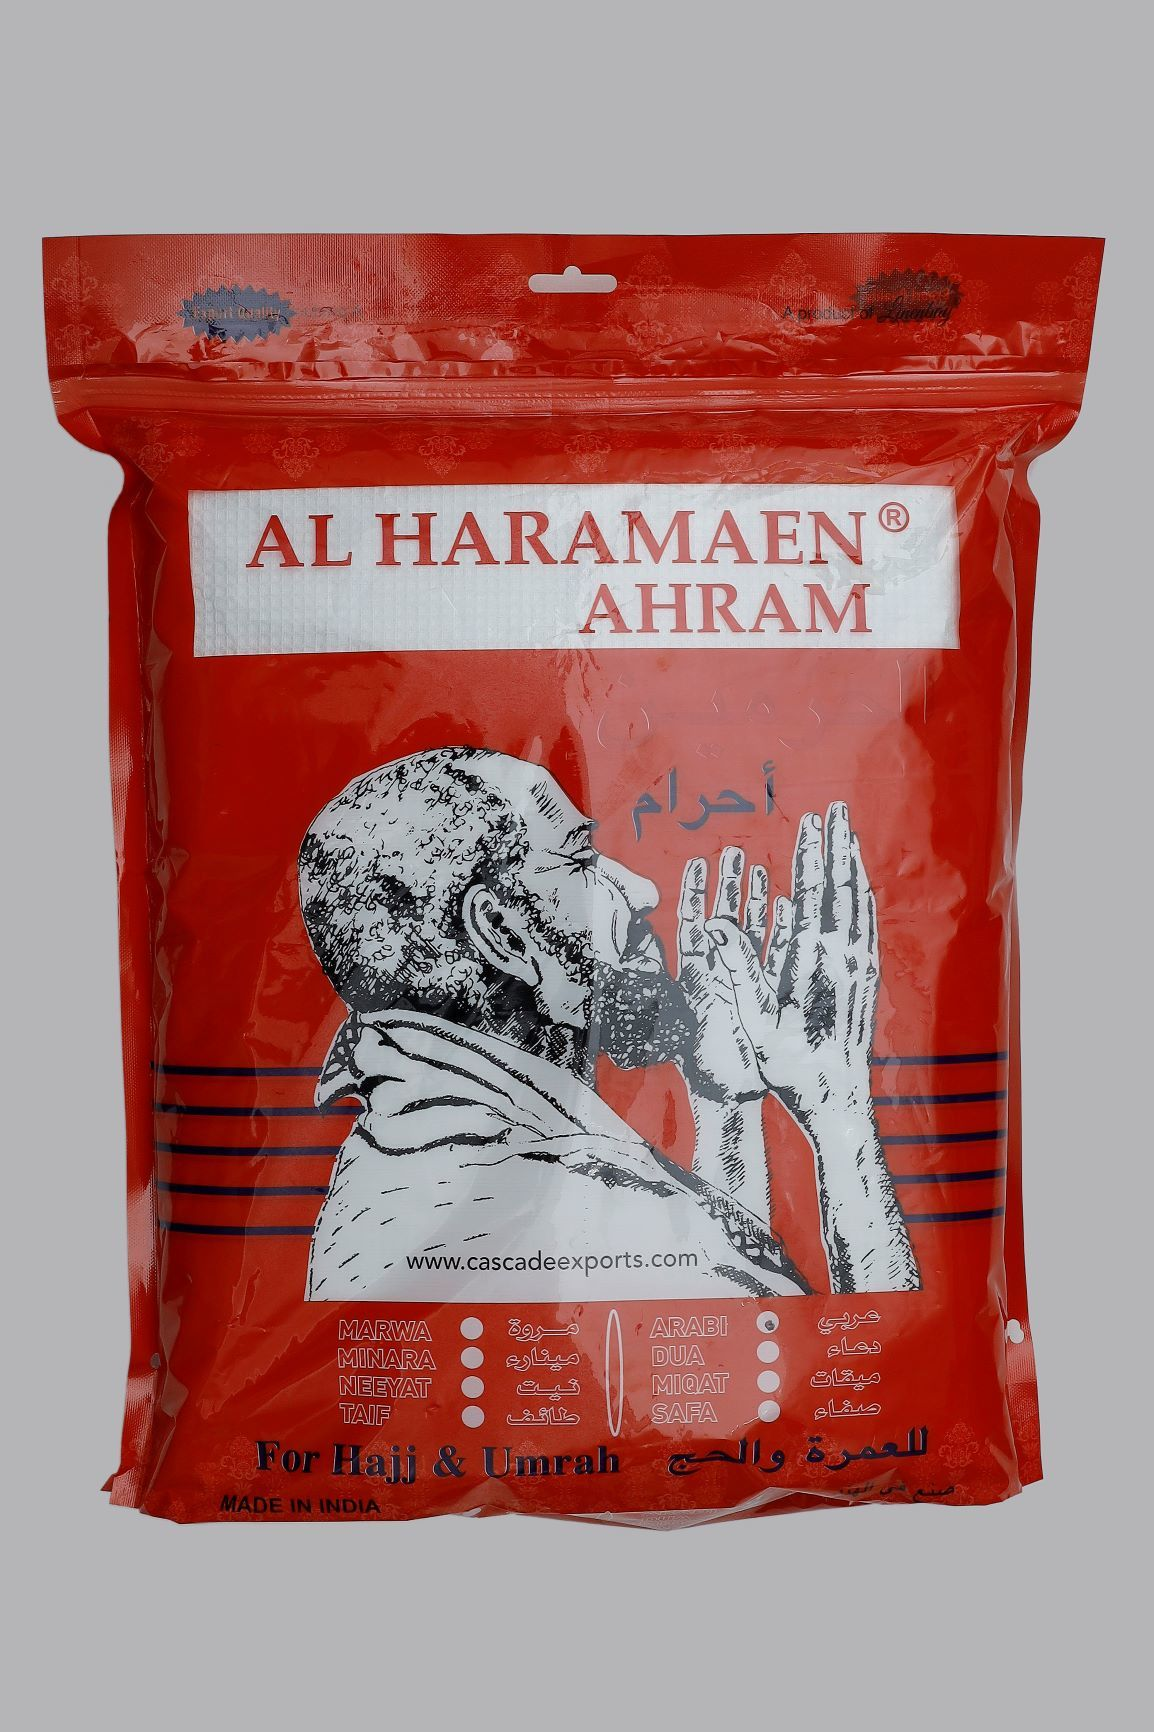 White Cotton Arabi Fabric Hajj Towel